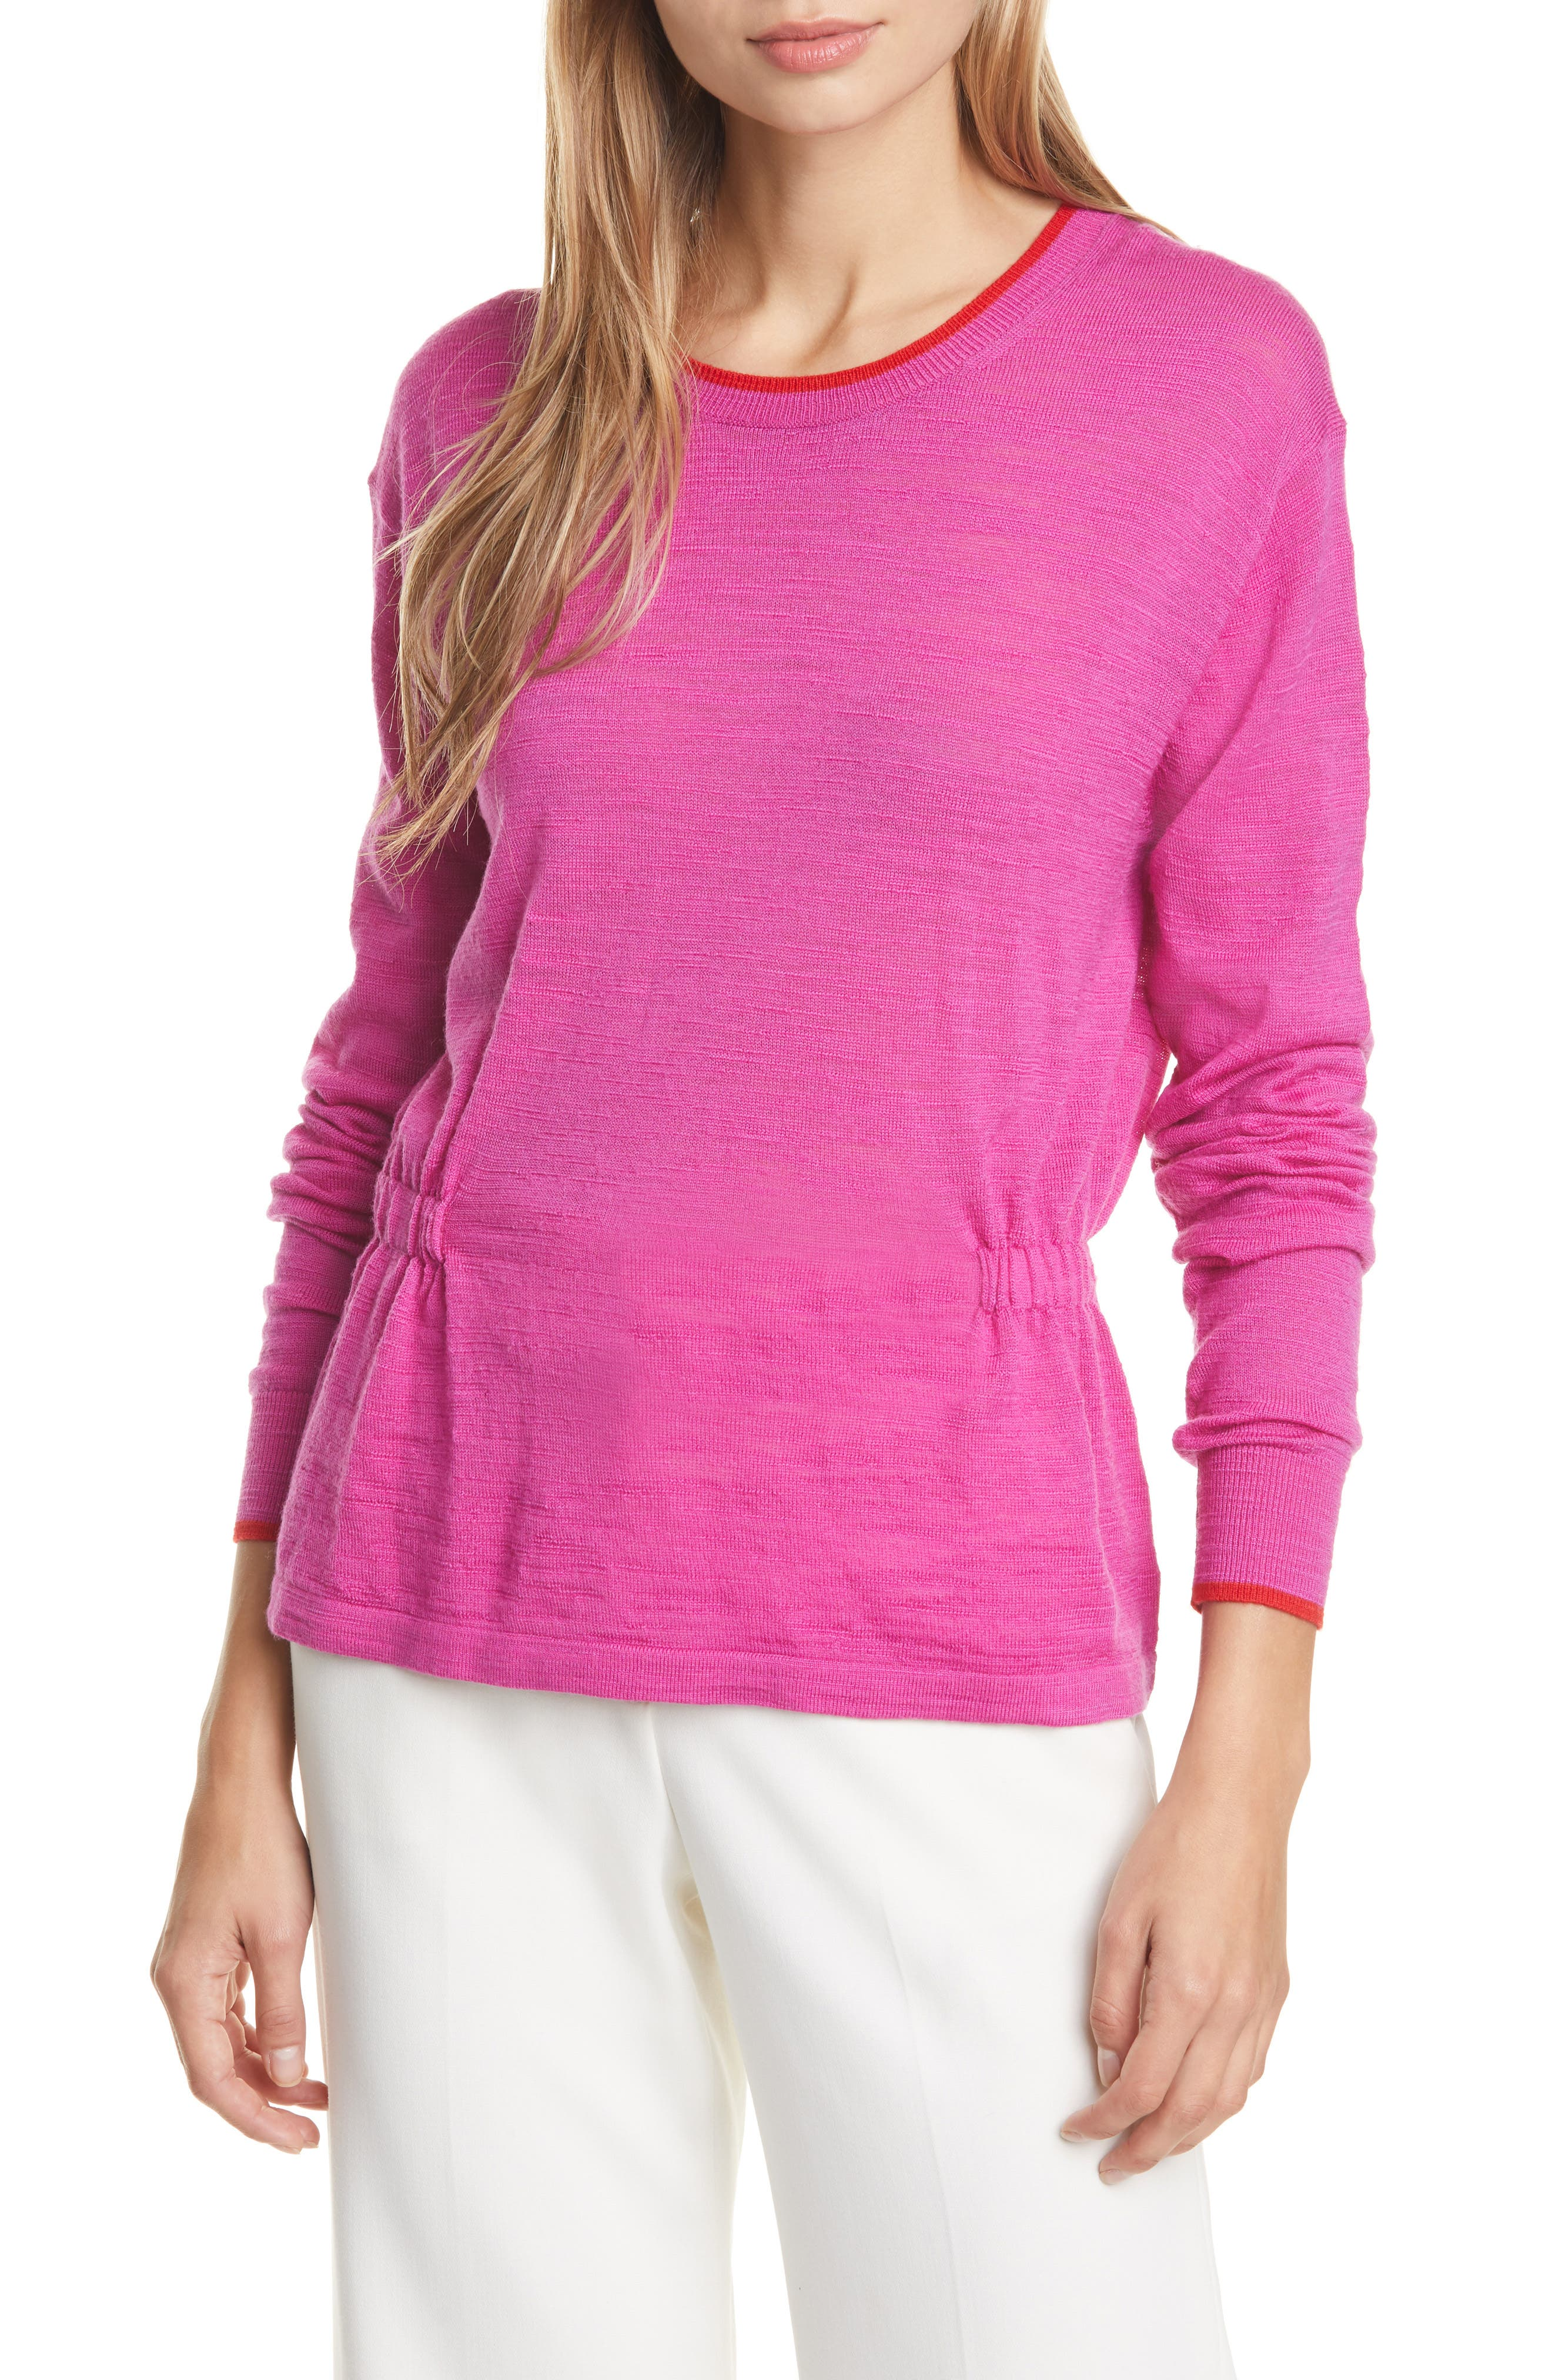 Veronica Beard Sweaters Charlene Cinched Merino Wool Sweater